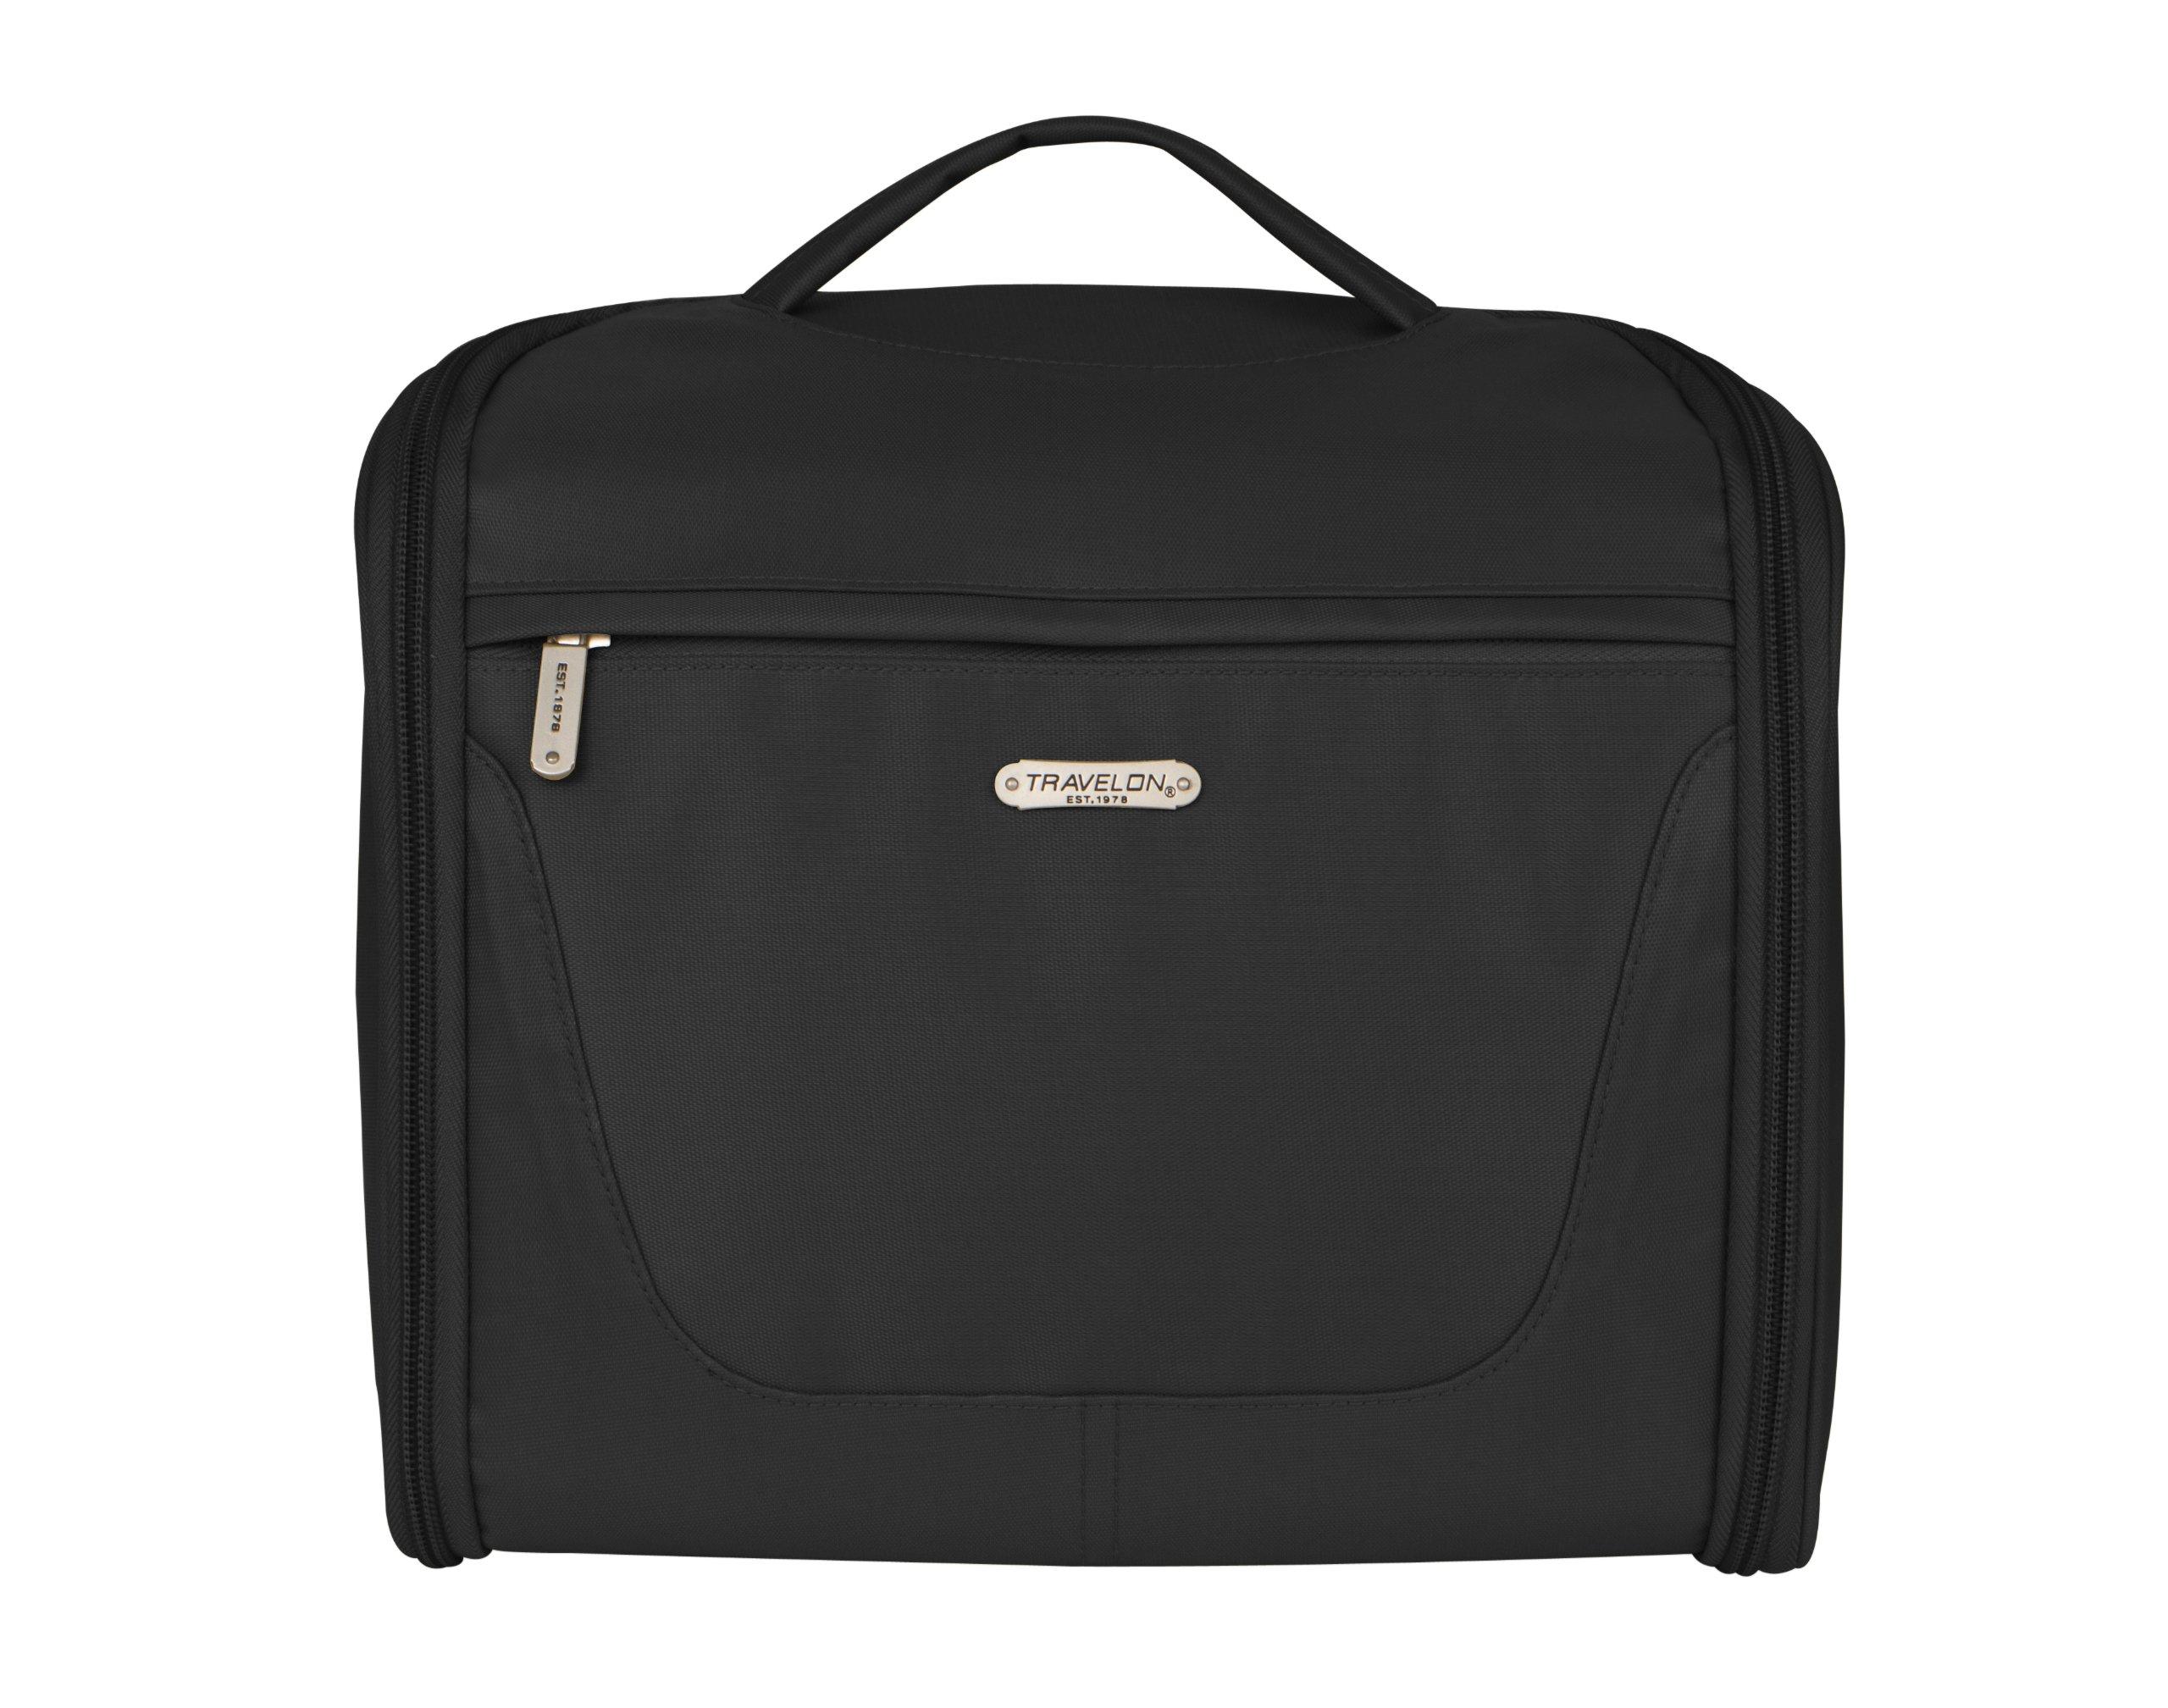 Travelon Mini Independence Bag, Black, One Size